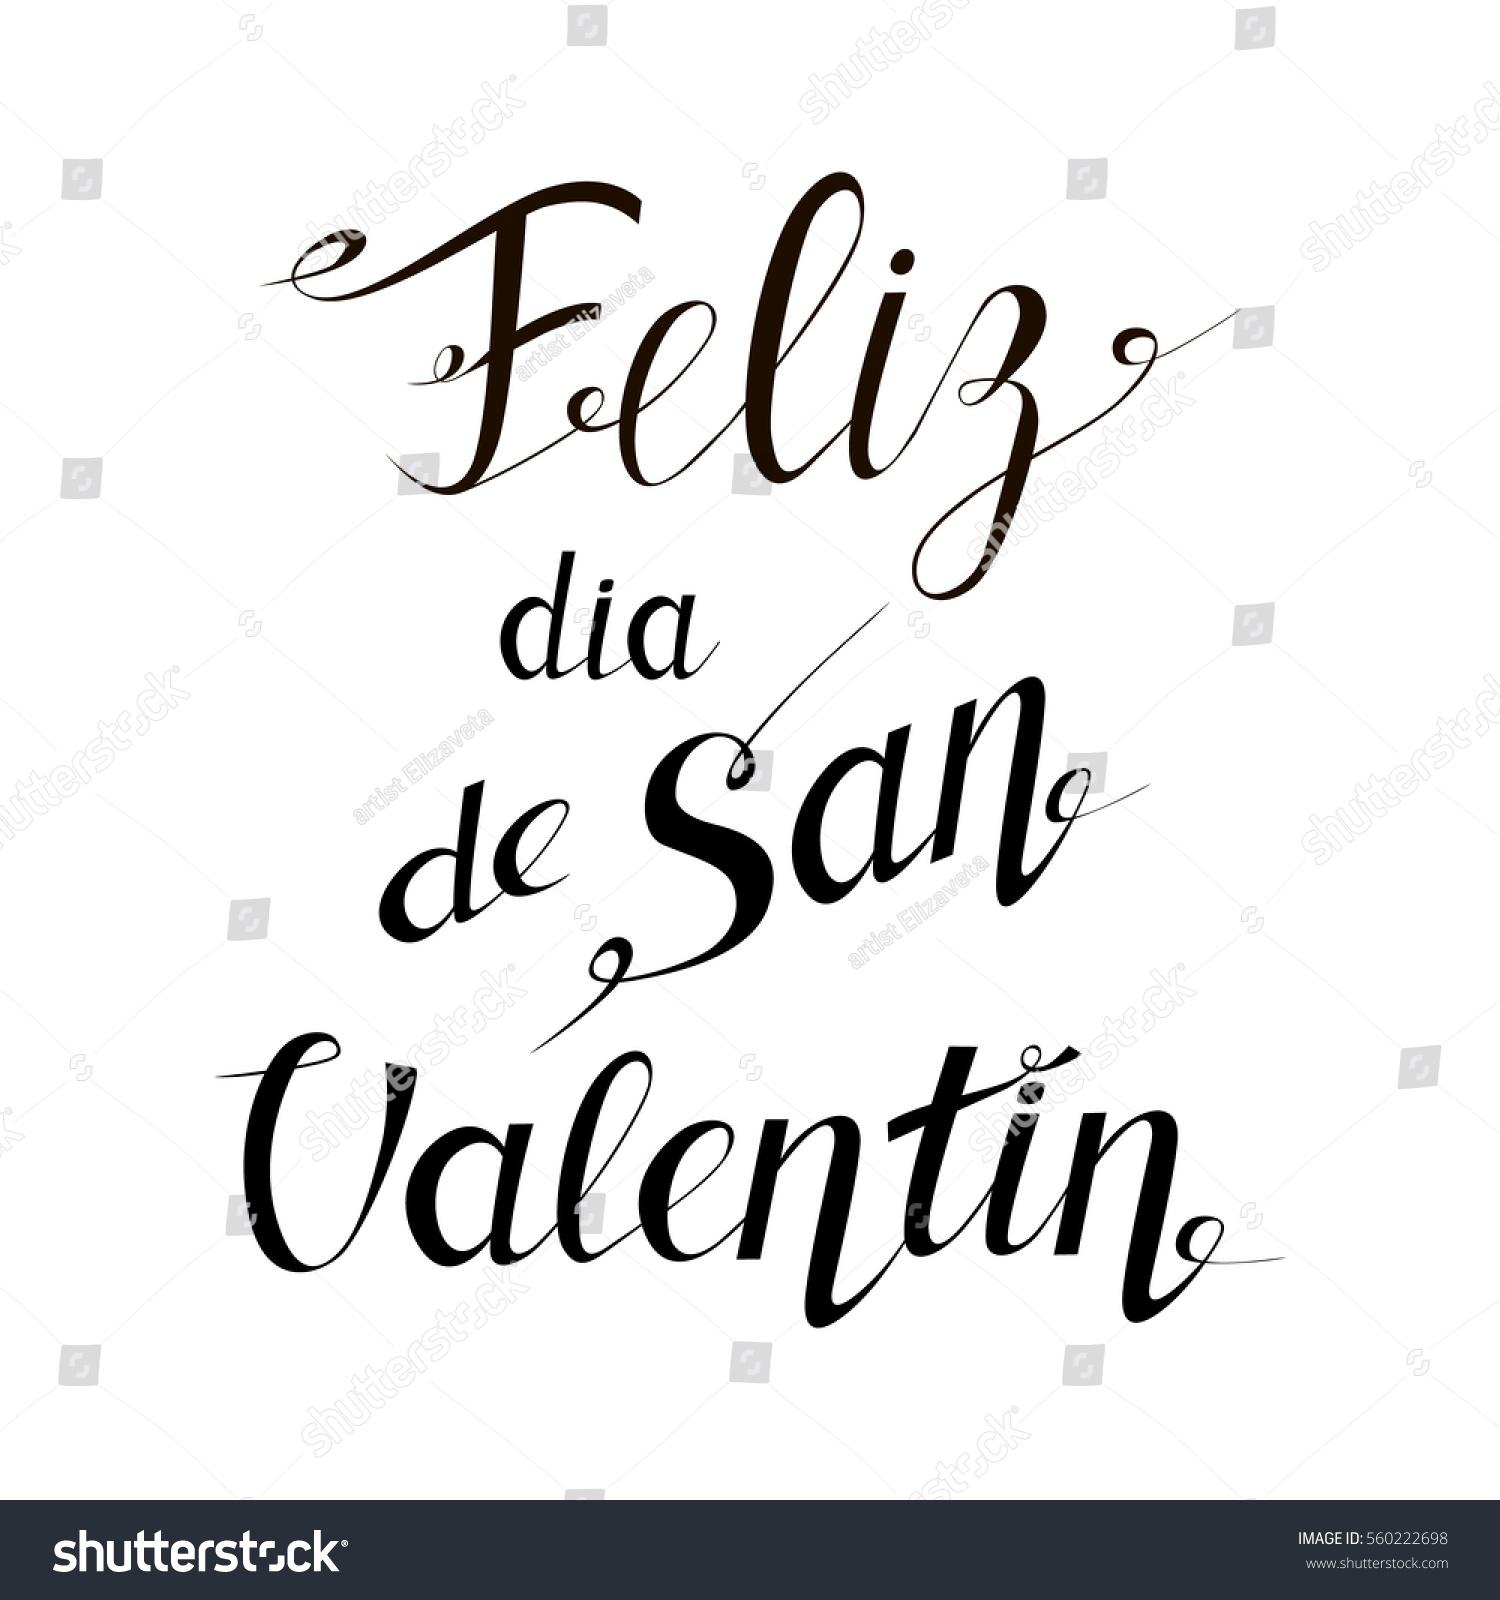 Feliz Dia De San Valentin   Happy Valentineu0027s Day Translated From Spanish.  Hand Drawn Lettering